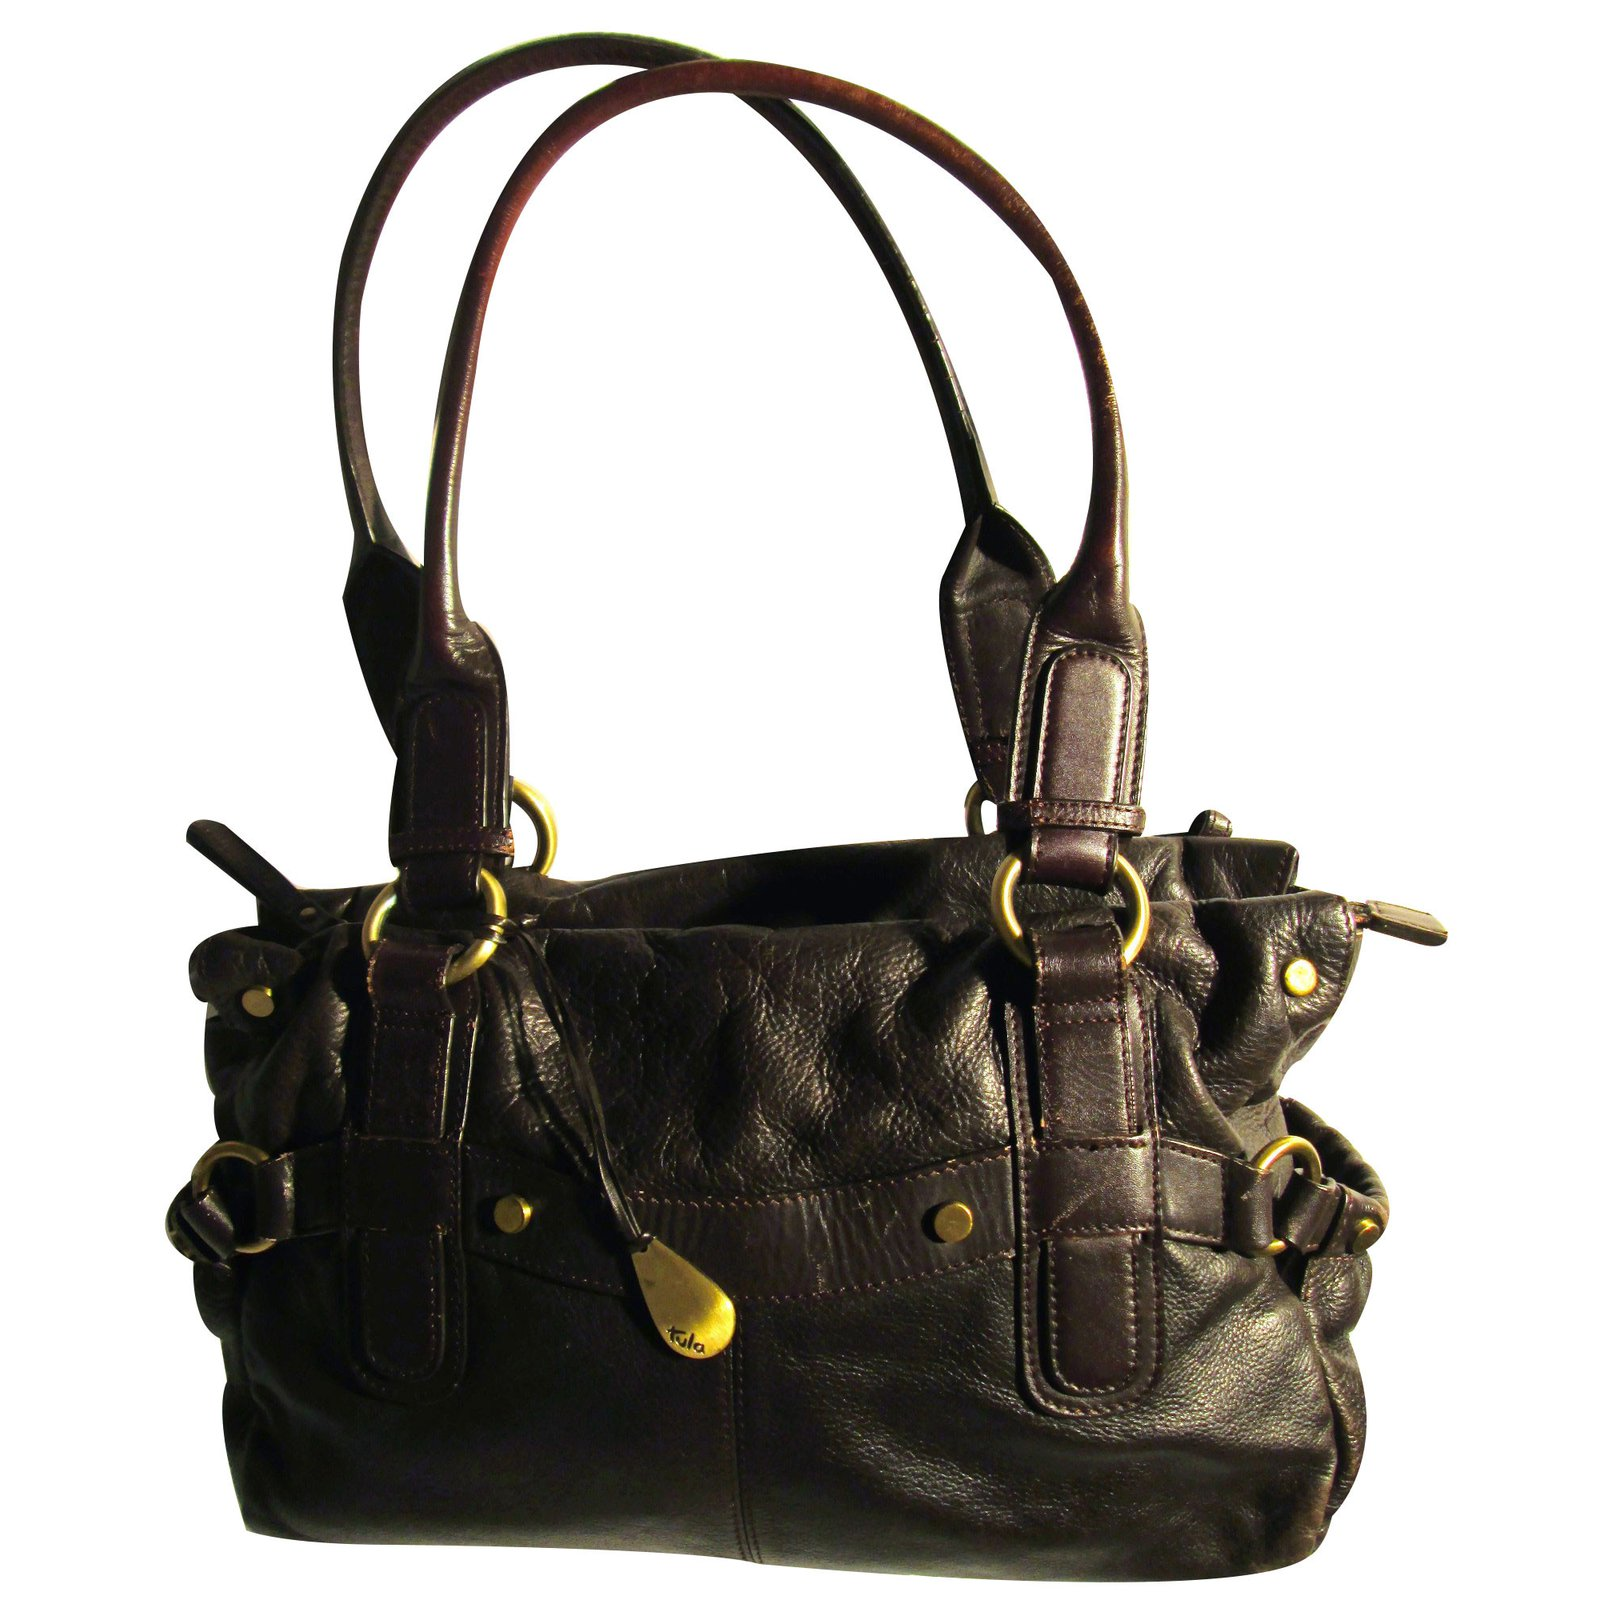 sacs main autre marque sac main tula cuir marron joli closet. Black Bedroom Furniture Sets. Home Design Ideas